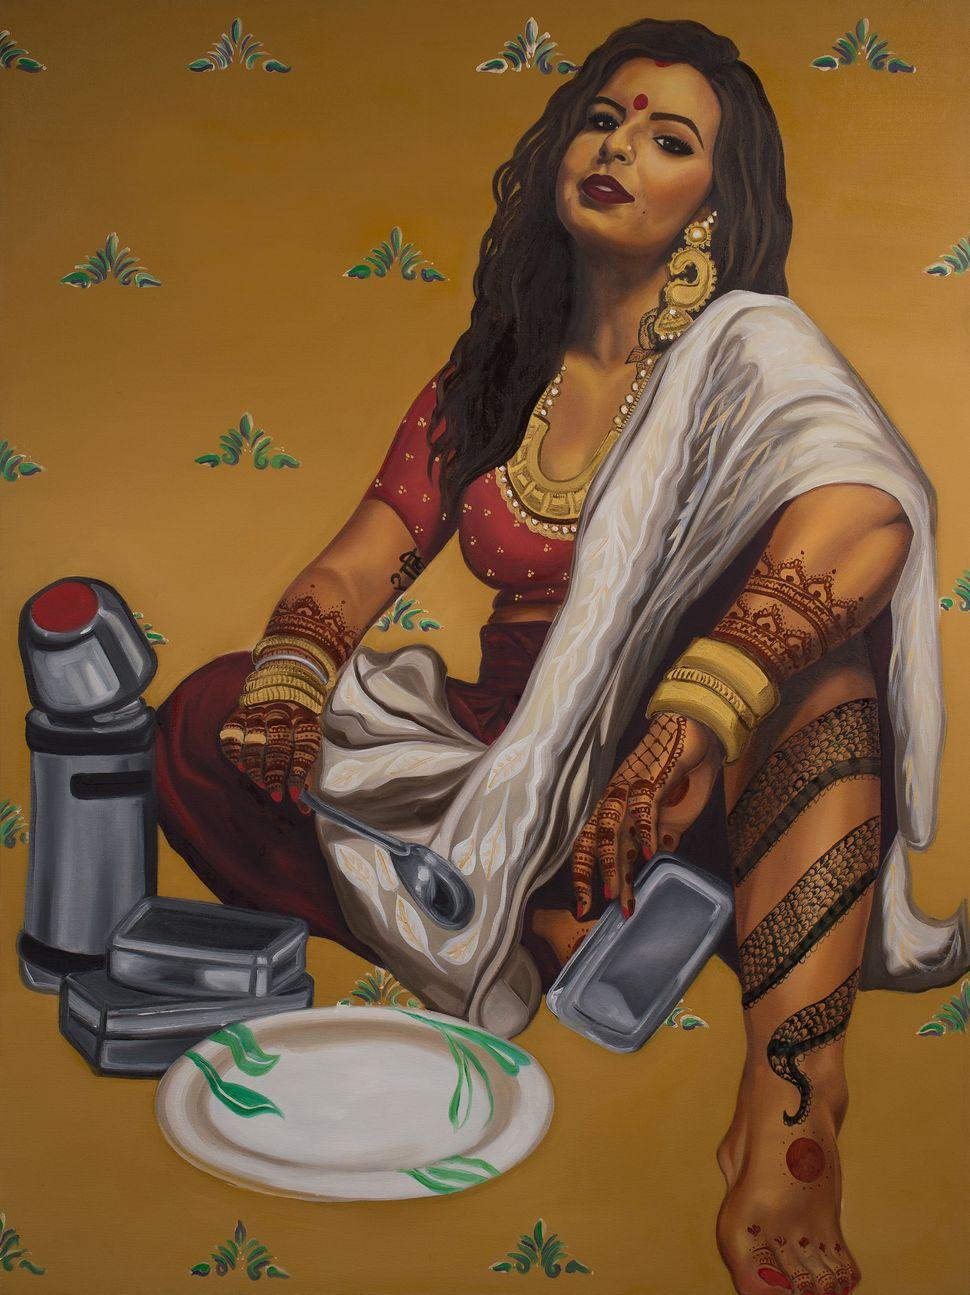 This Feminist Artist Paints Indian Women As Badass Pinup Models   HuffPost